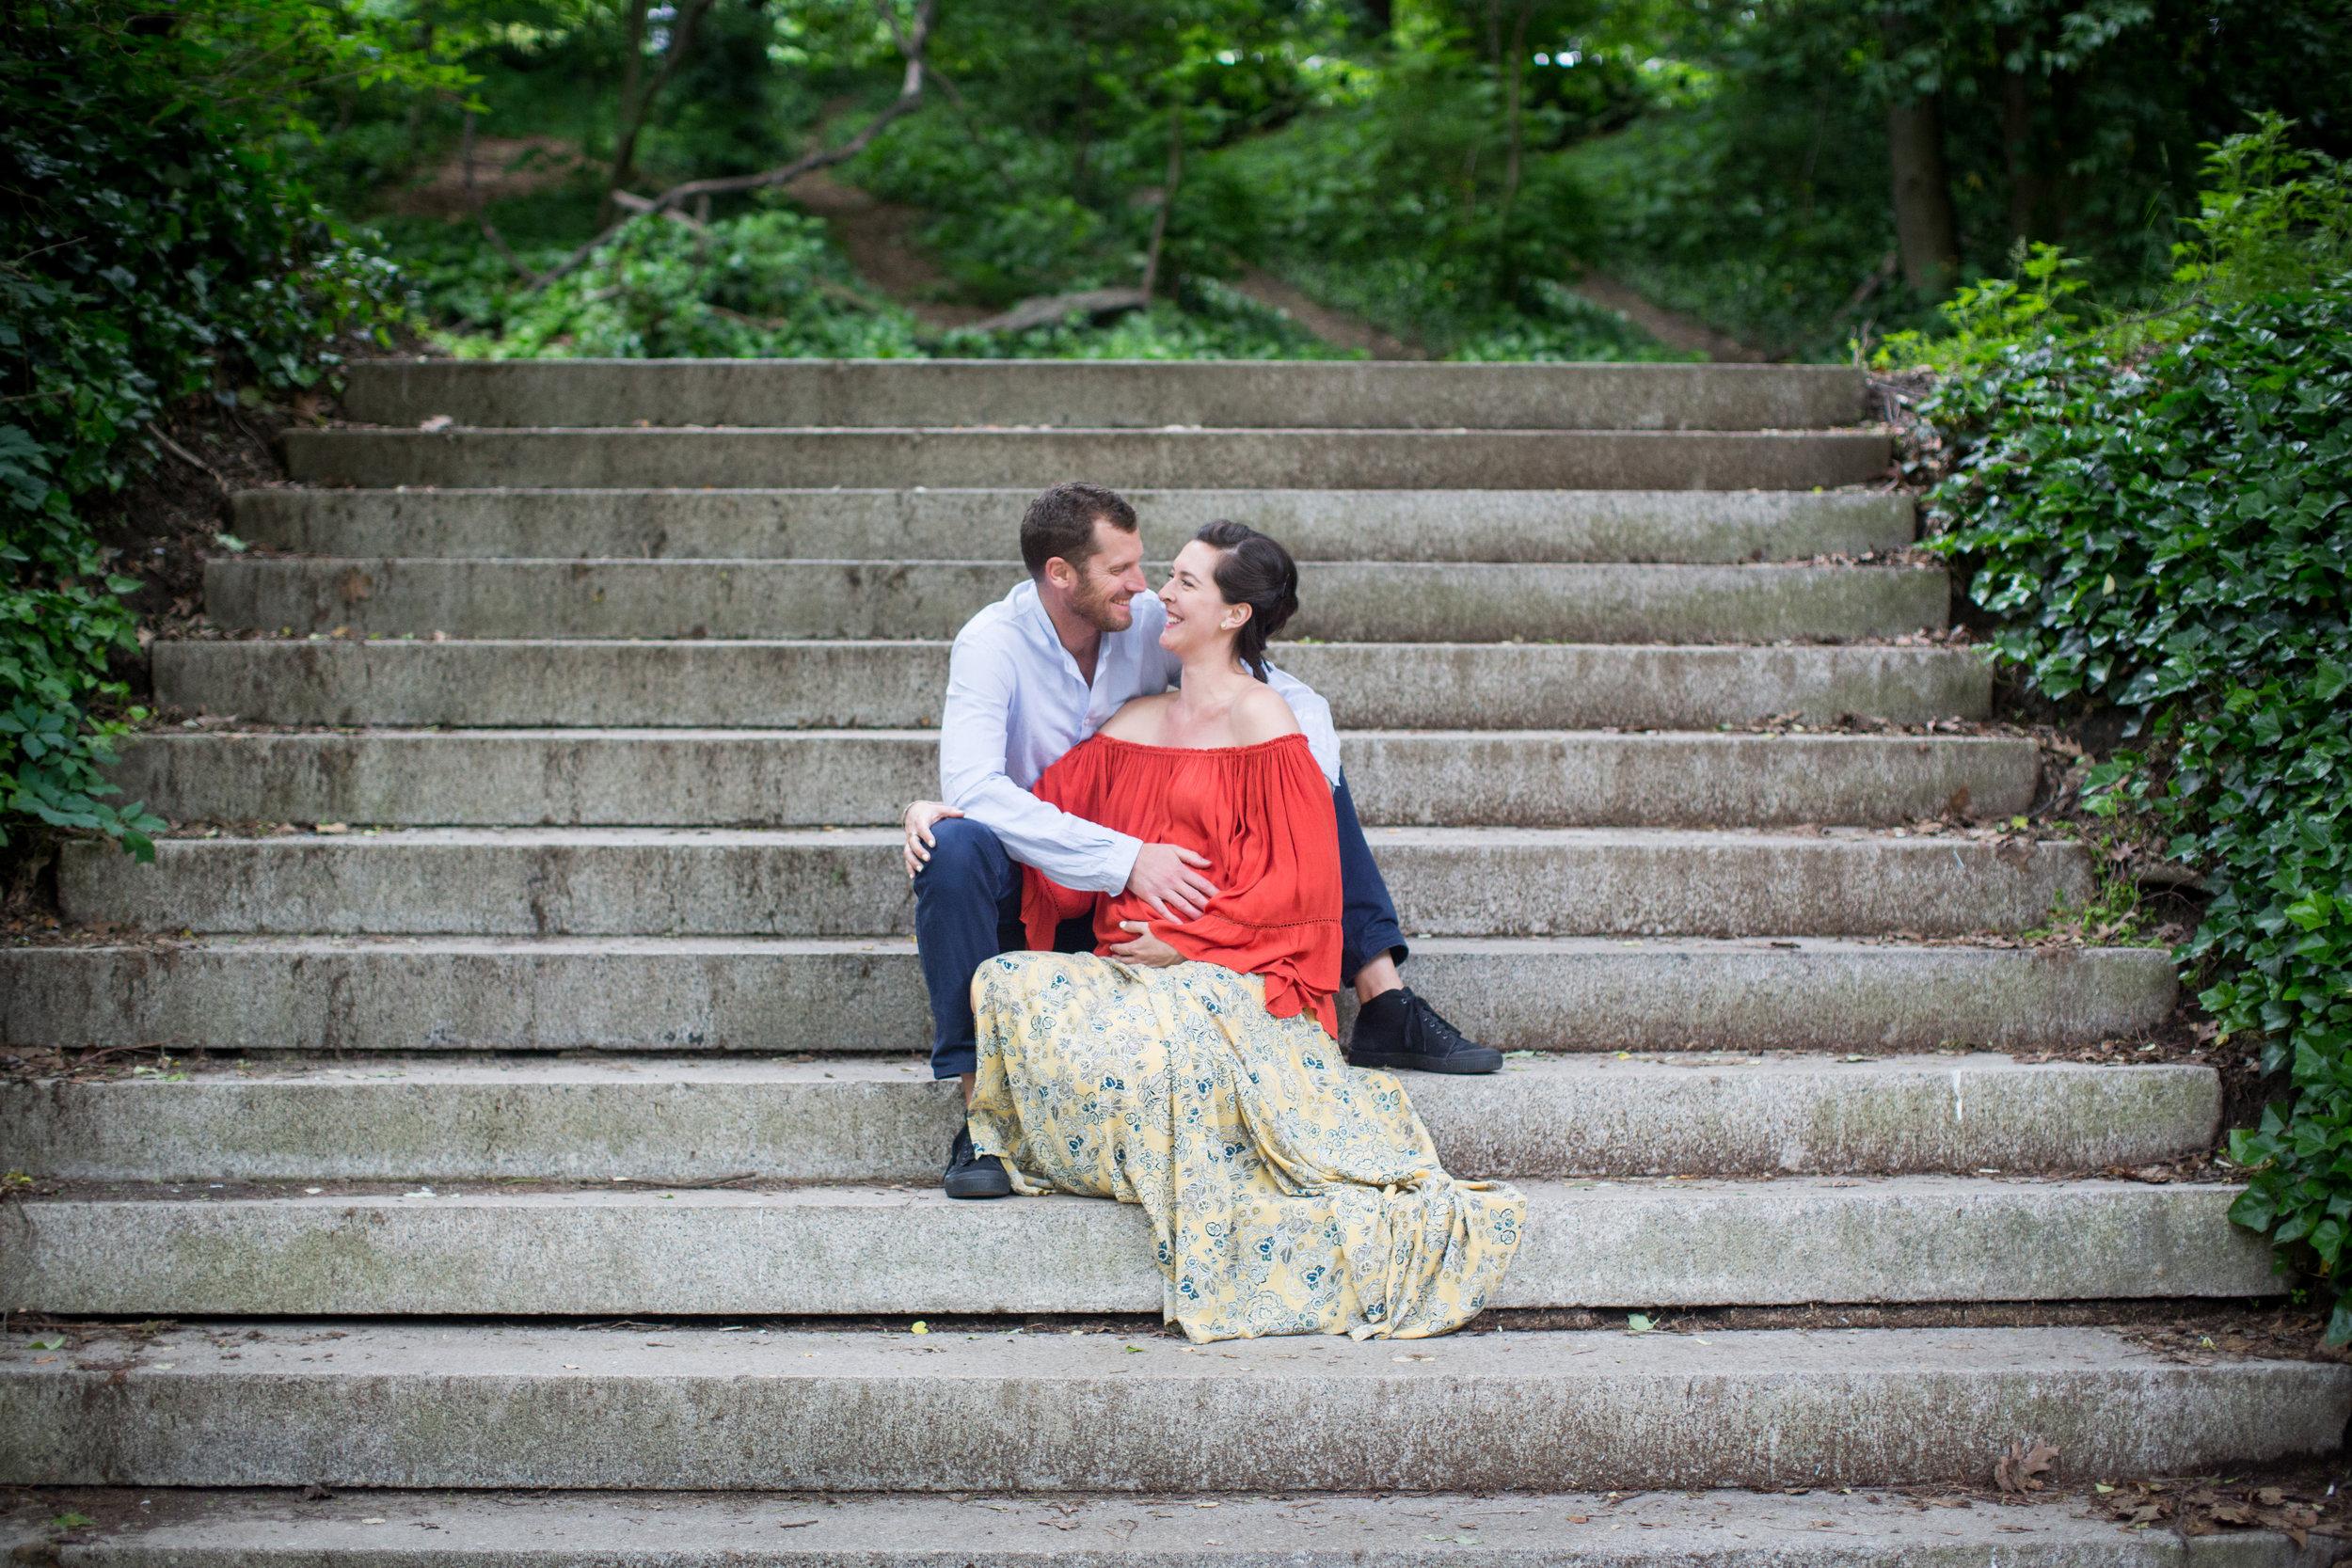 5-28_Bronya&Lucas_Maternity_0032.jpg_edit.JPG